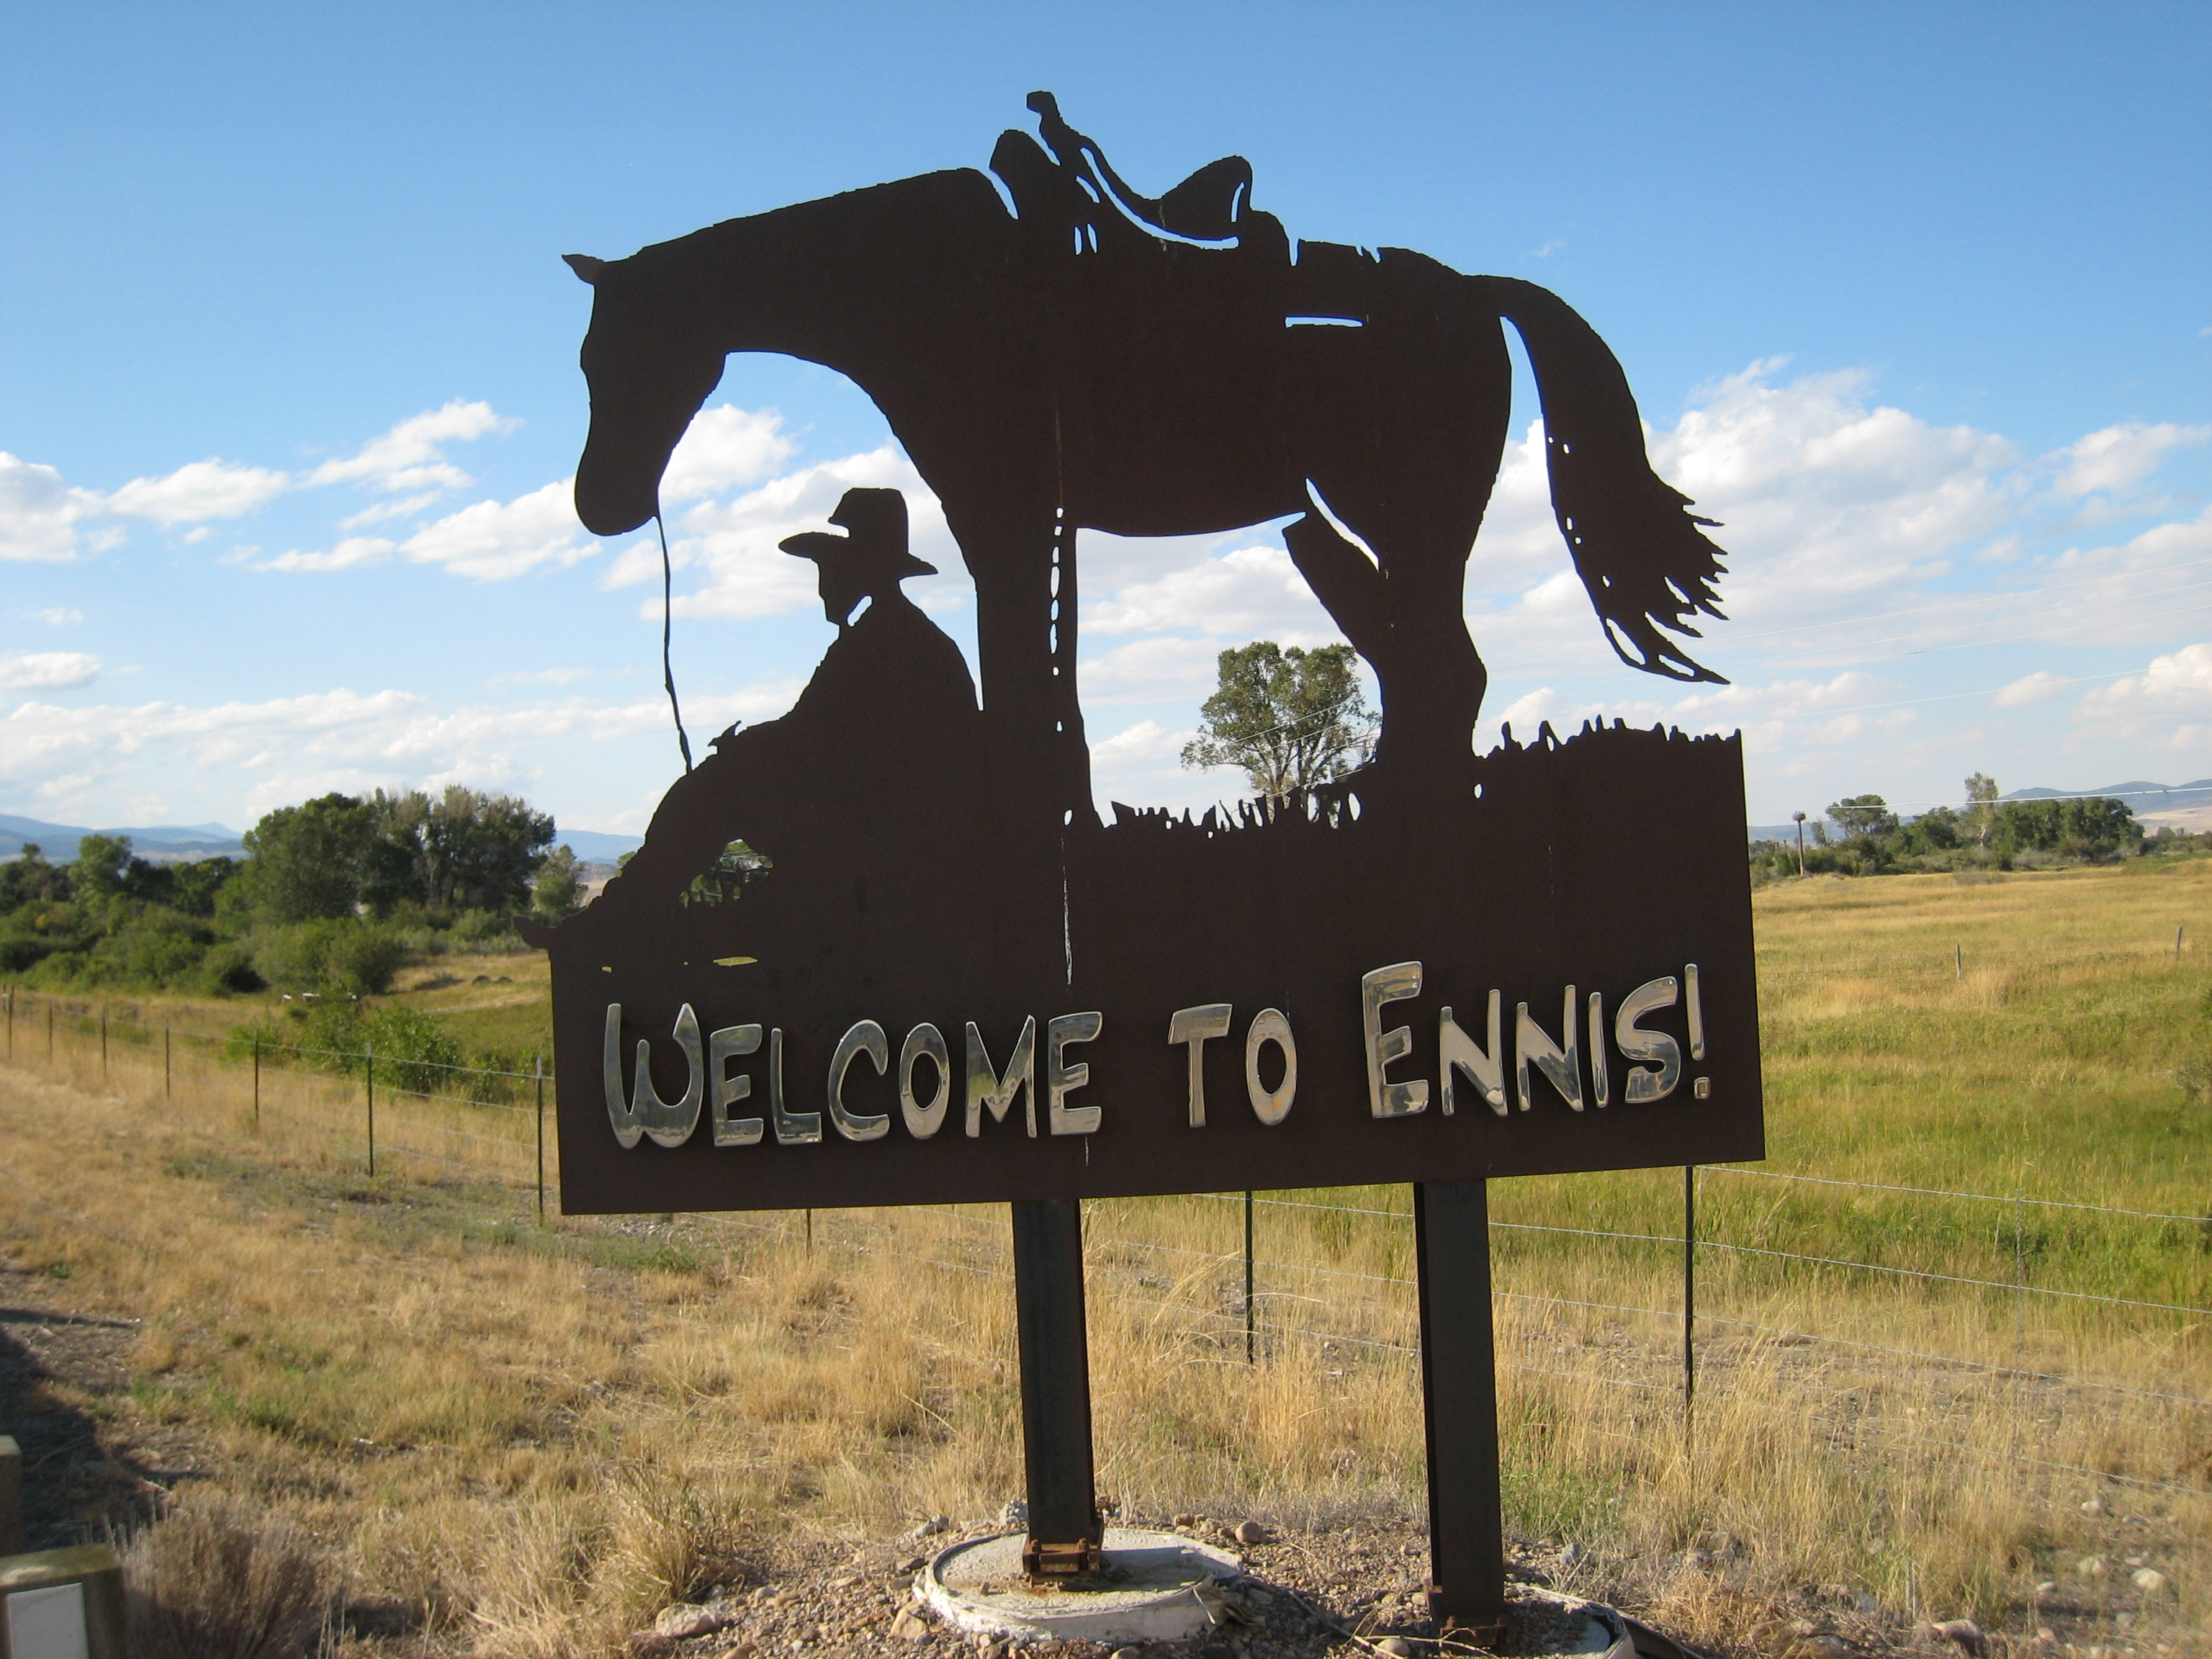 Montana art in Ennis, MT